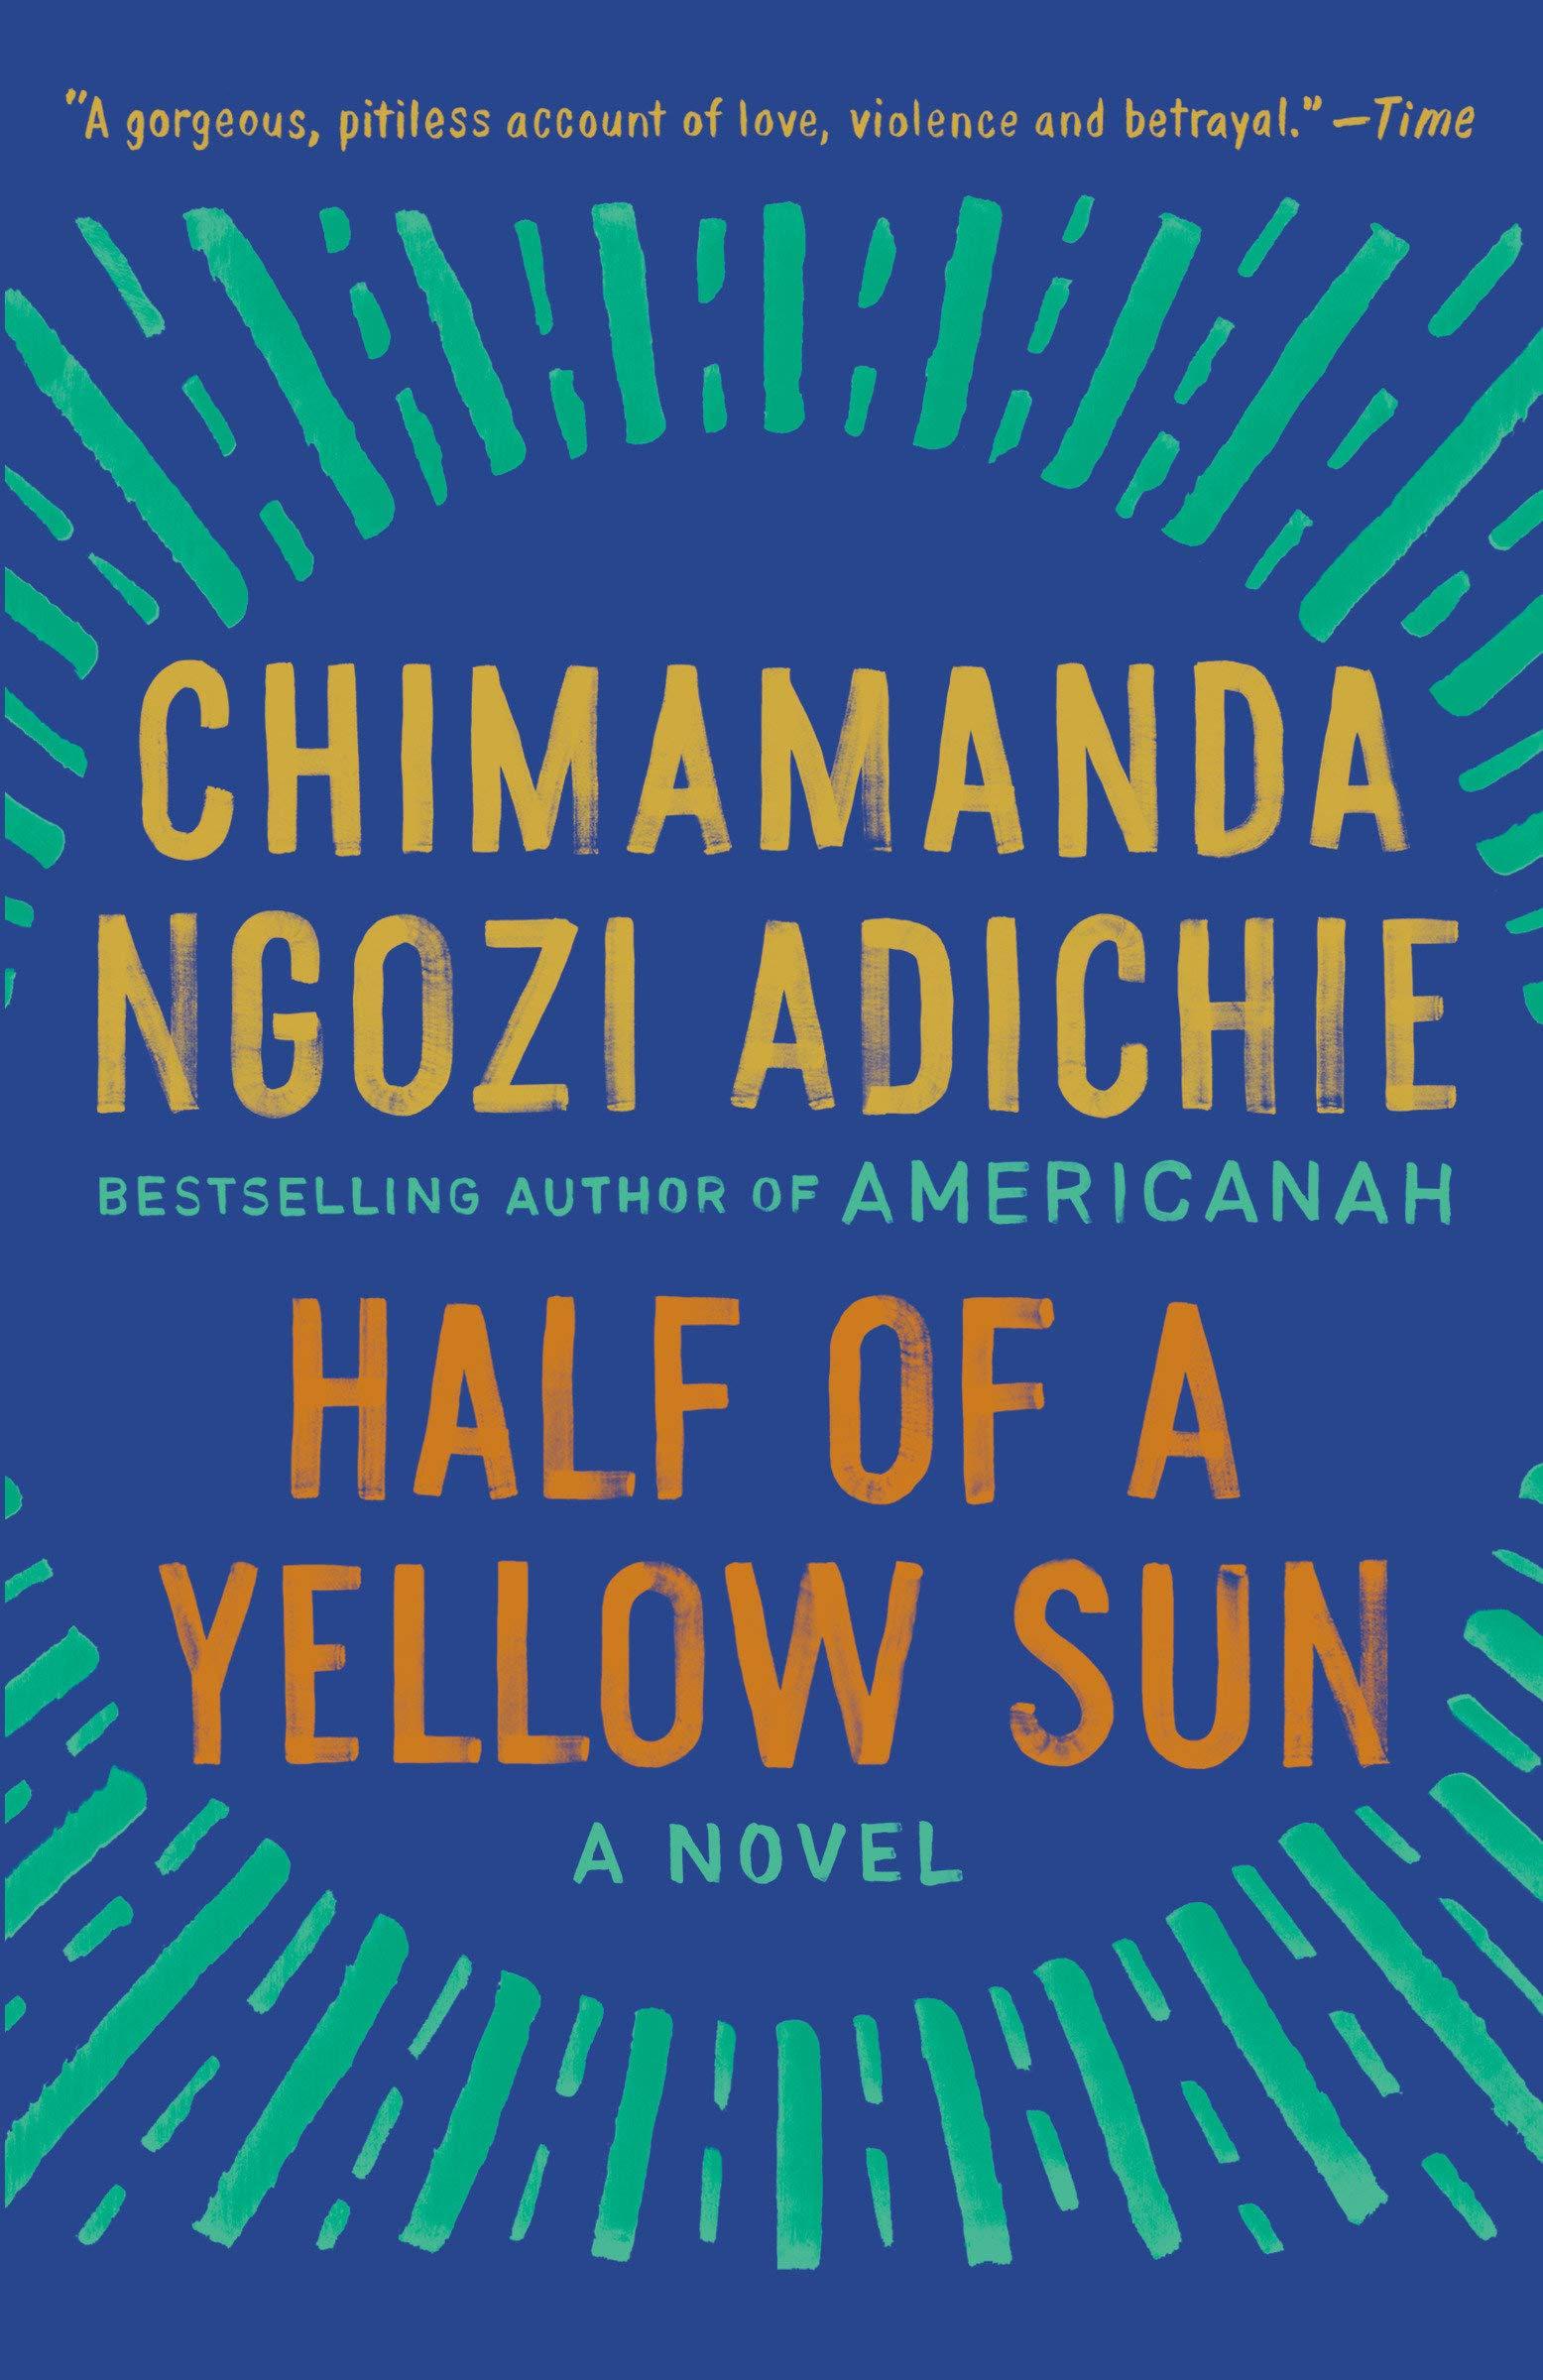 Amazon Com Half Of A Yellow Sun 8601401173335 Adichie Chimamanda Ngozi Books